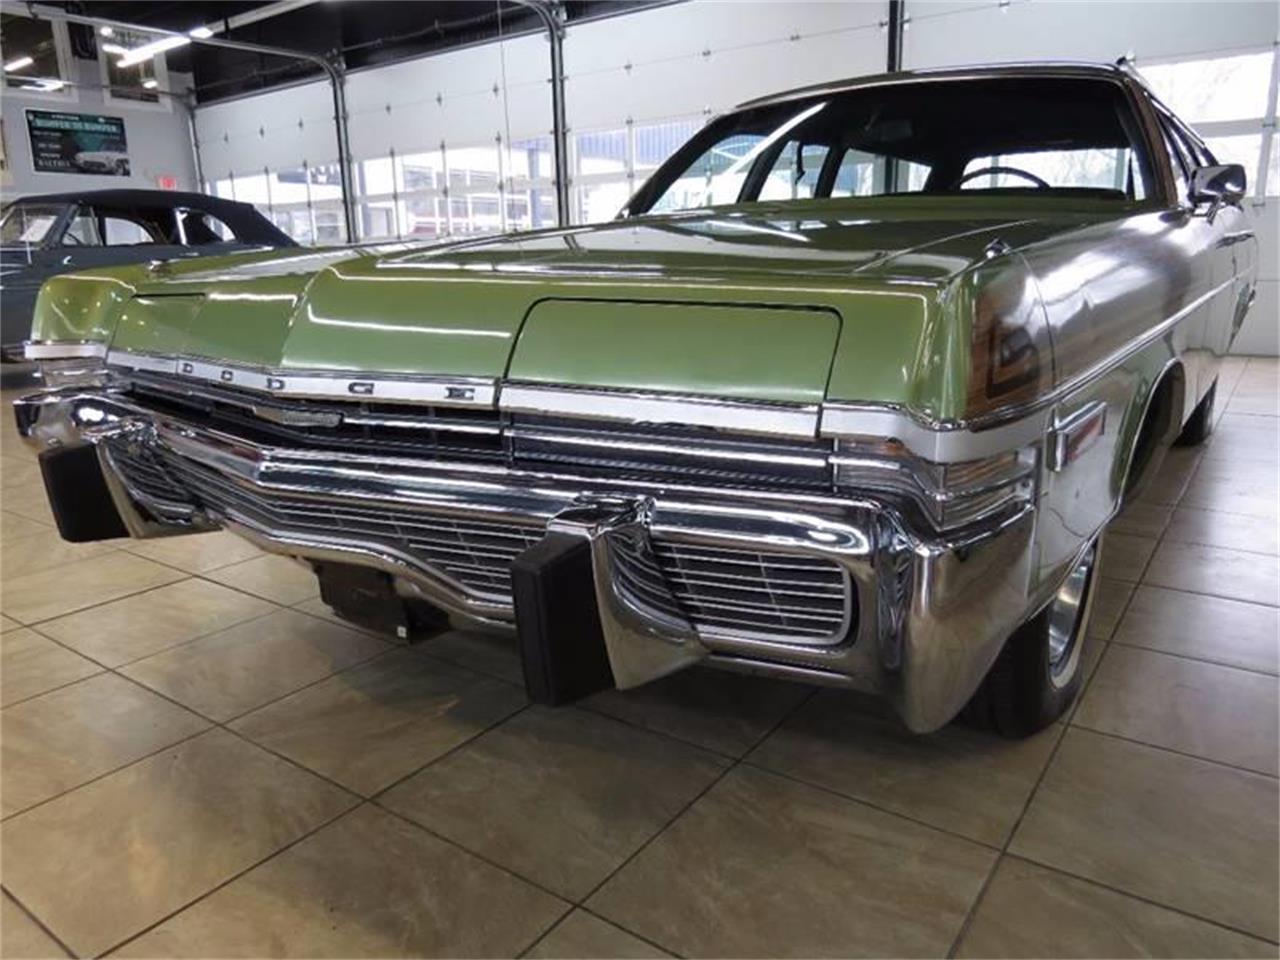 For Sale: 1973 Dodge Monaco in St  Charles, Illinois